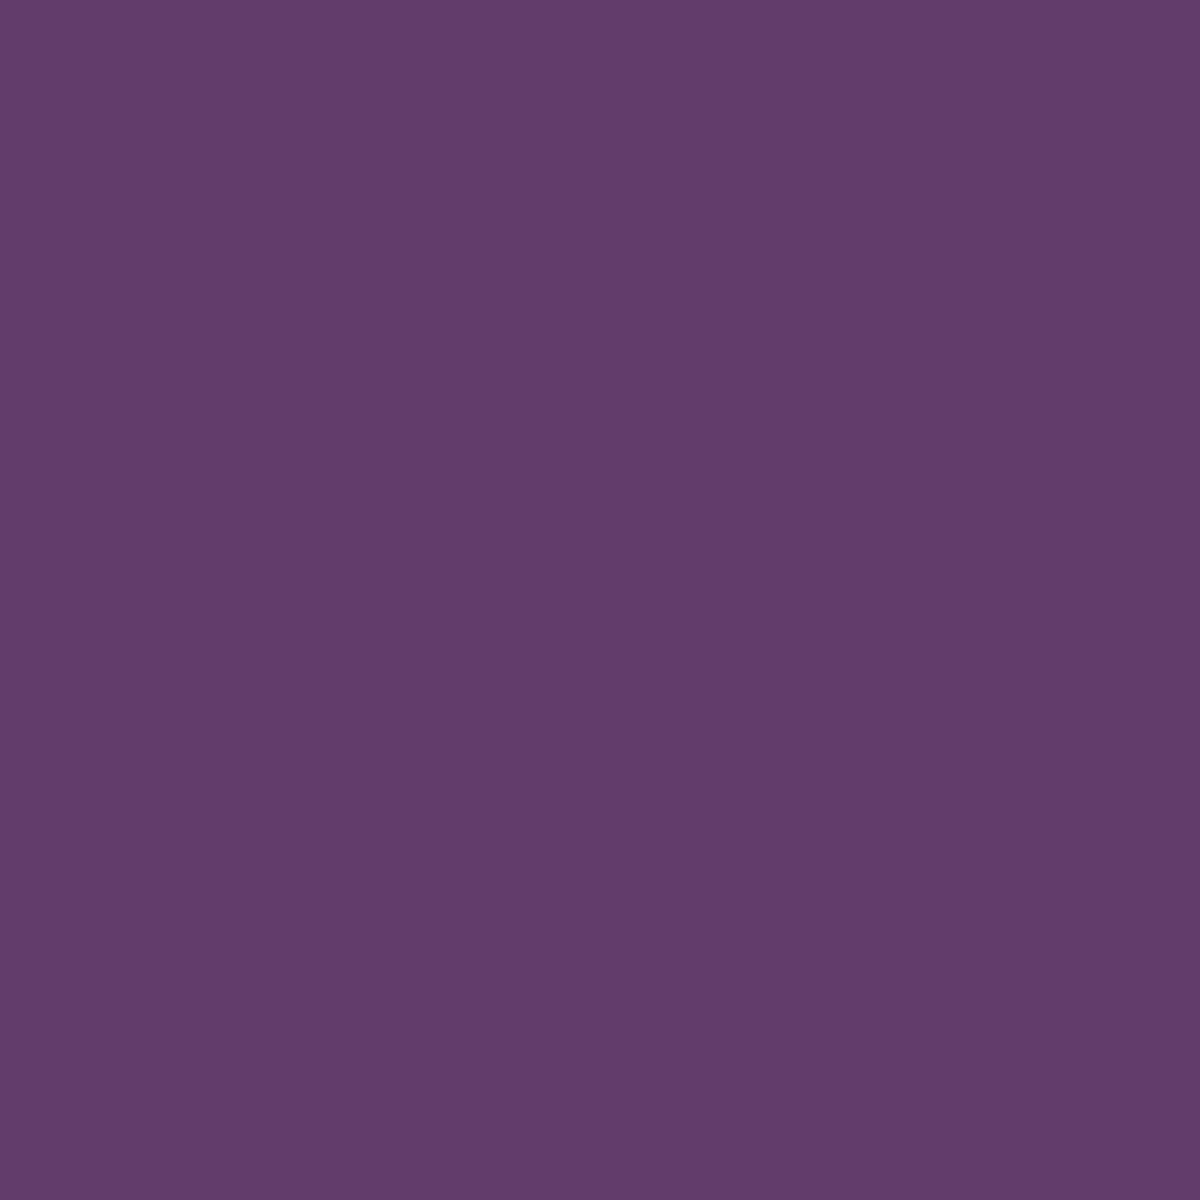 Riley Blake, Confetti Eggplant